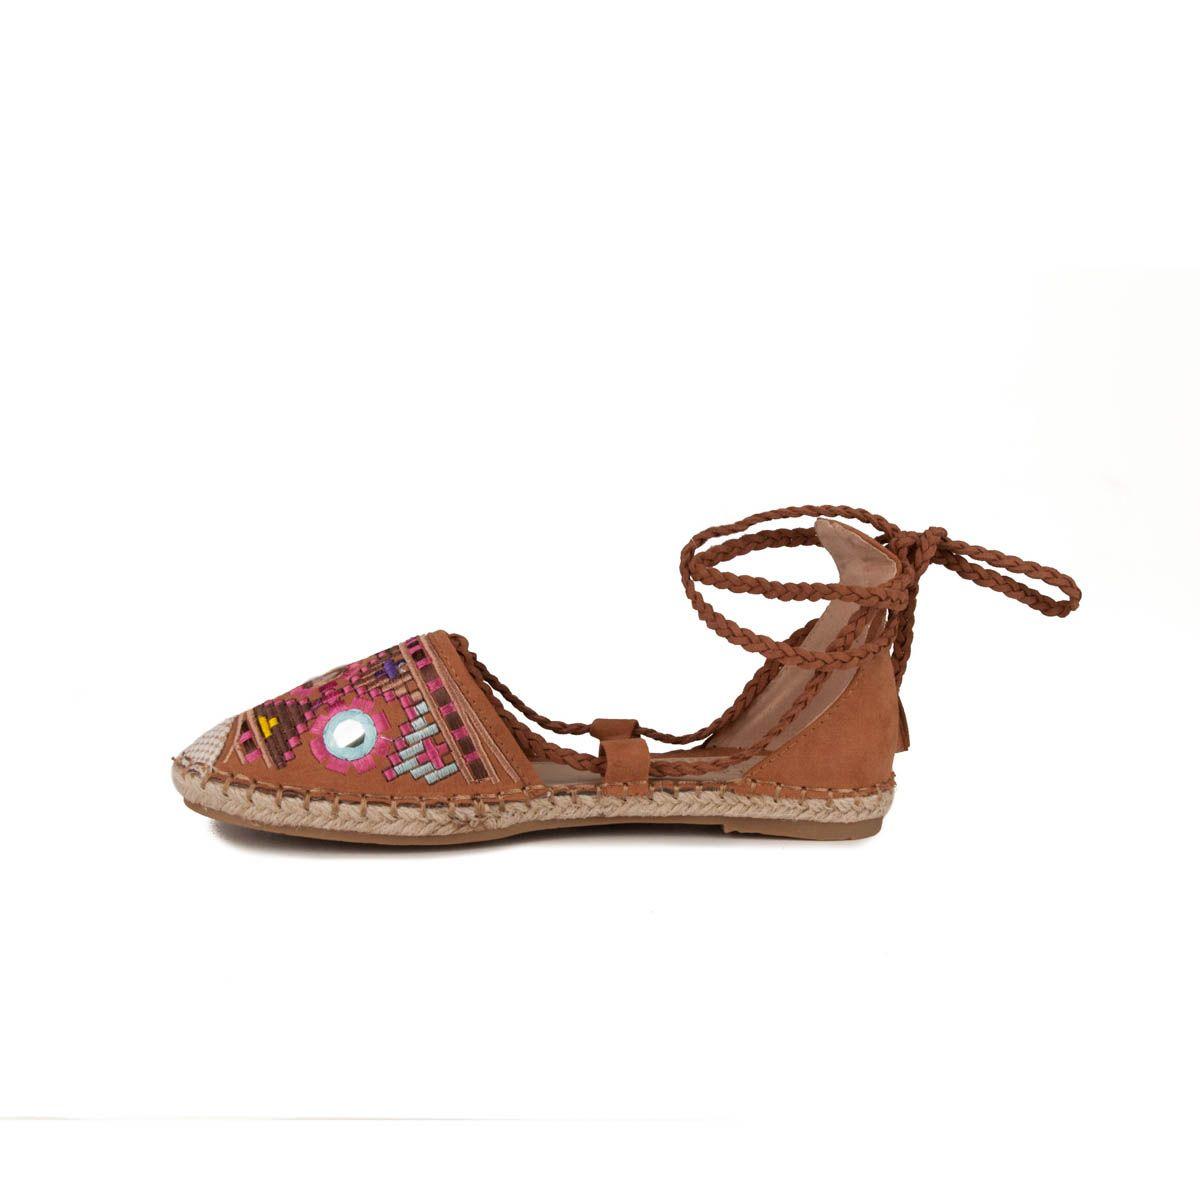 Montevita Flat Sandal in Camel